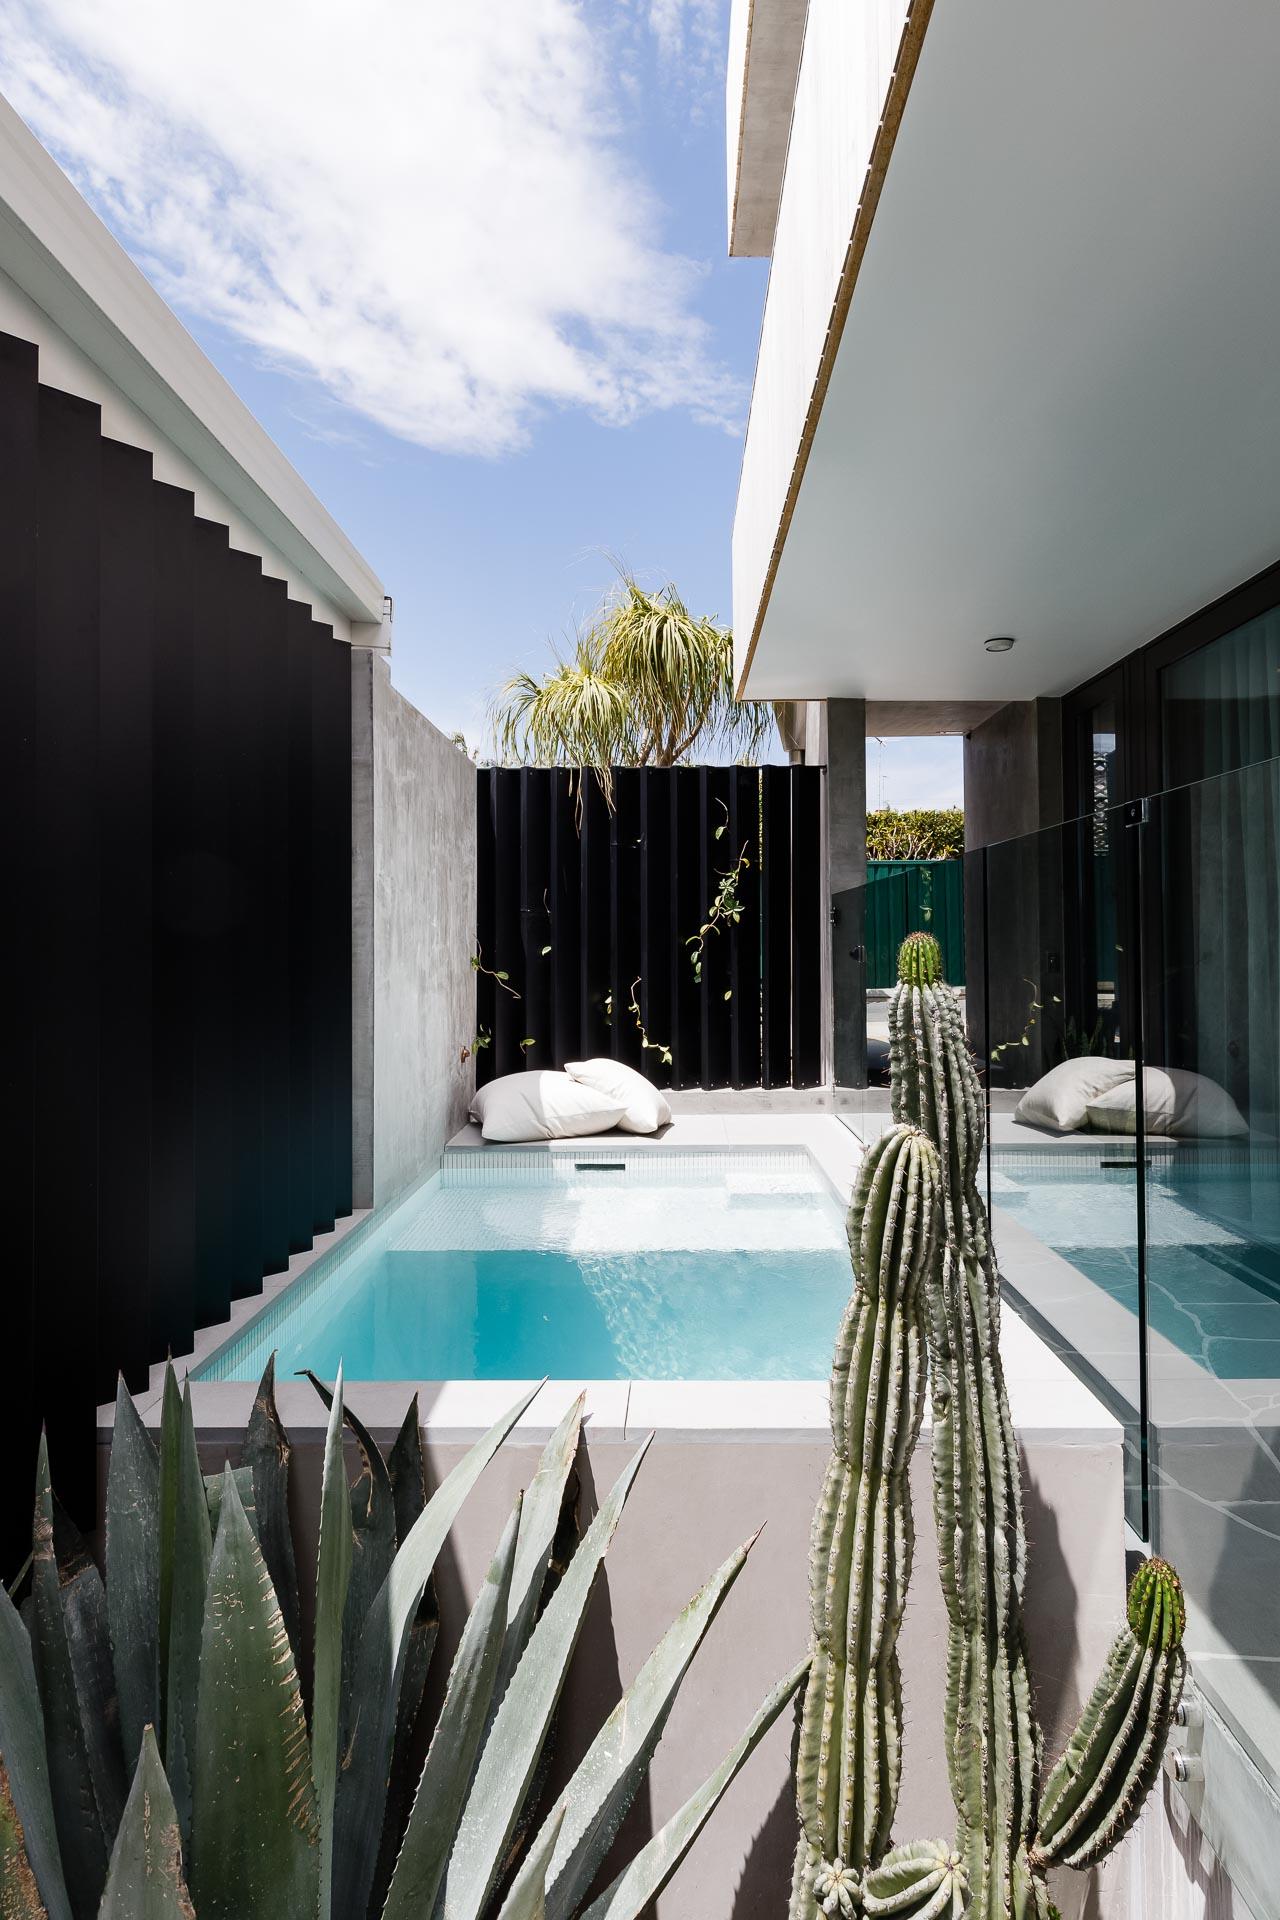 WEB - Architectural Photography Sydney - Open House Perth 2018  - Sebastian Photography 25.jpg